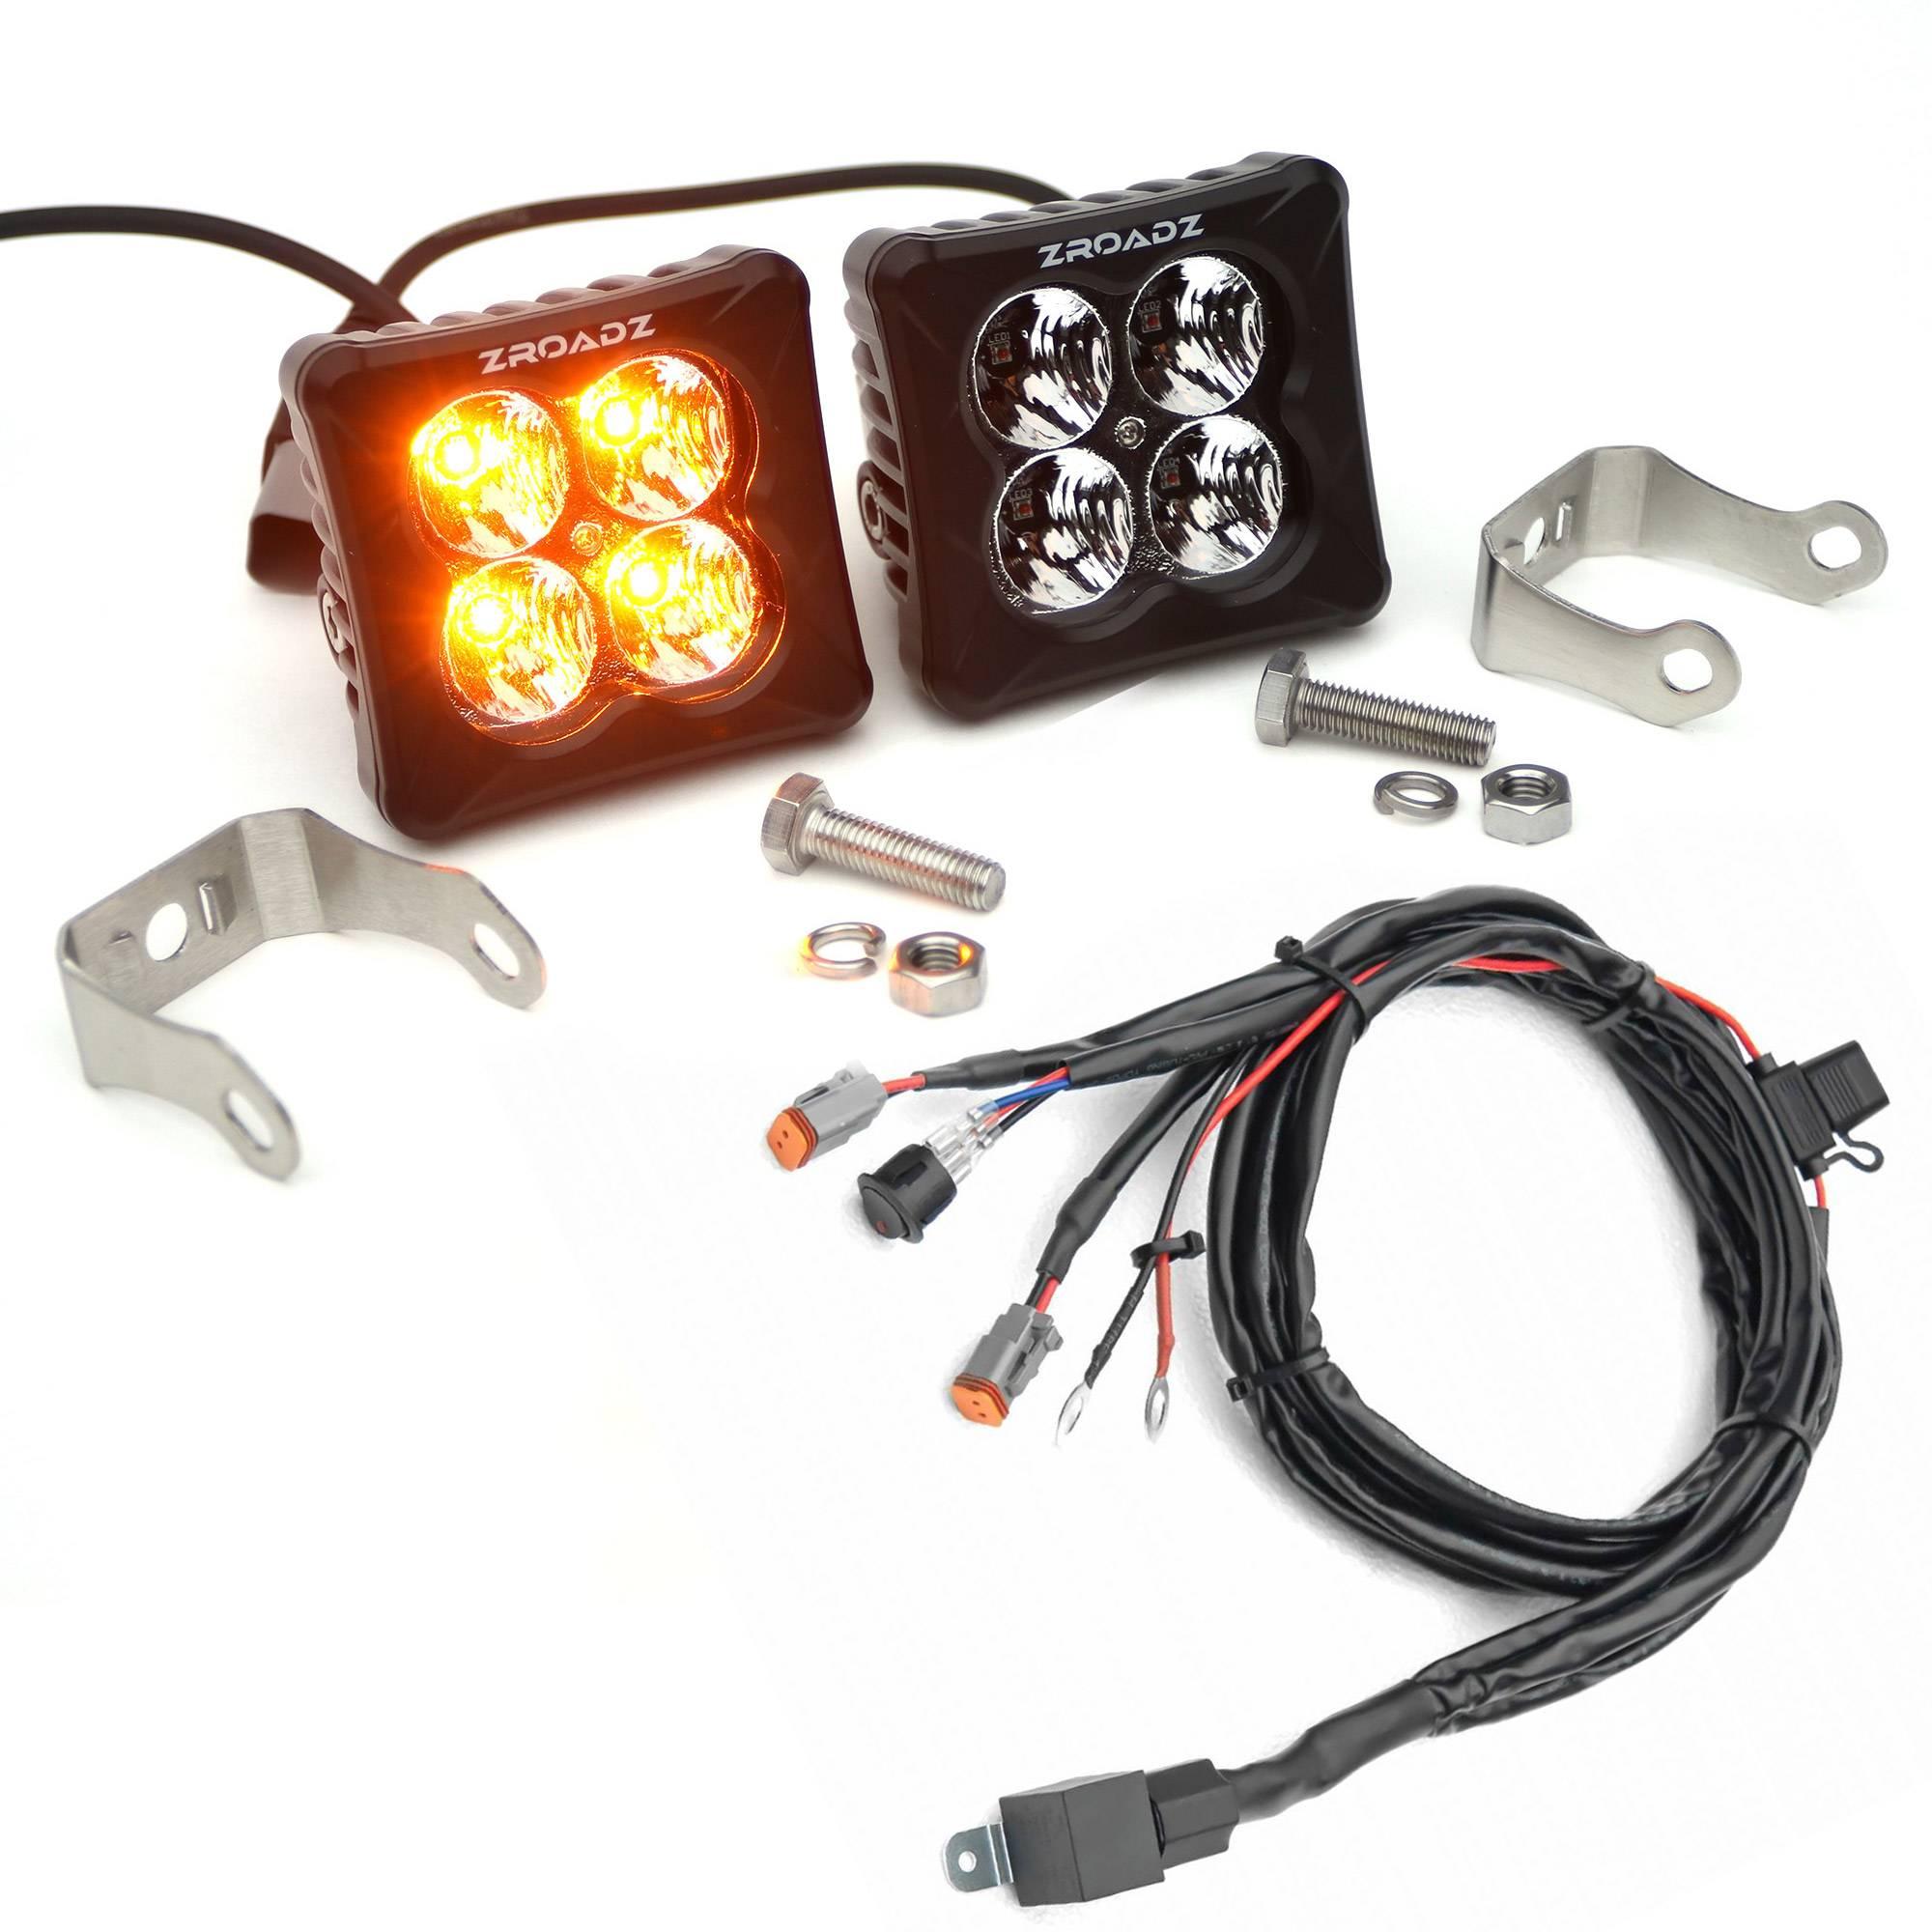 ZROADZ OFF ROAD PRODUCTS - 3 inch ZROADZ LED Light Pod Kit, G2 Series, Amber, Flood Beam, 2 Piece Kit With Wiring Harness - PN #Z30BC12W-D3A-K